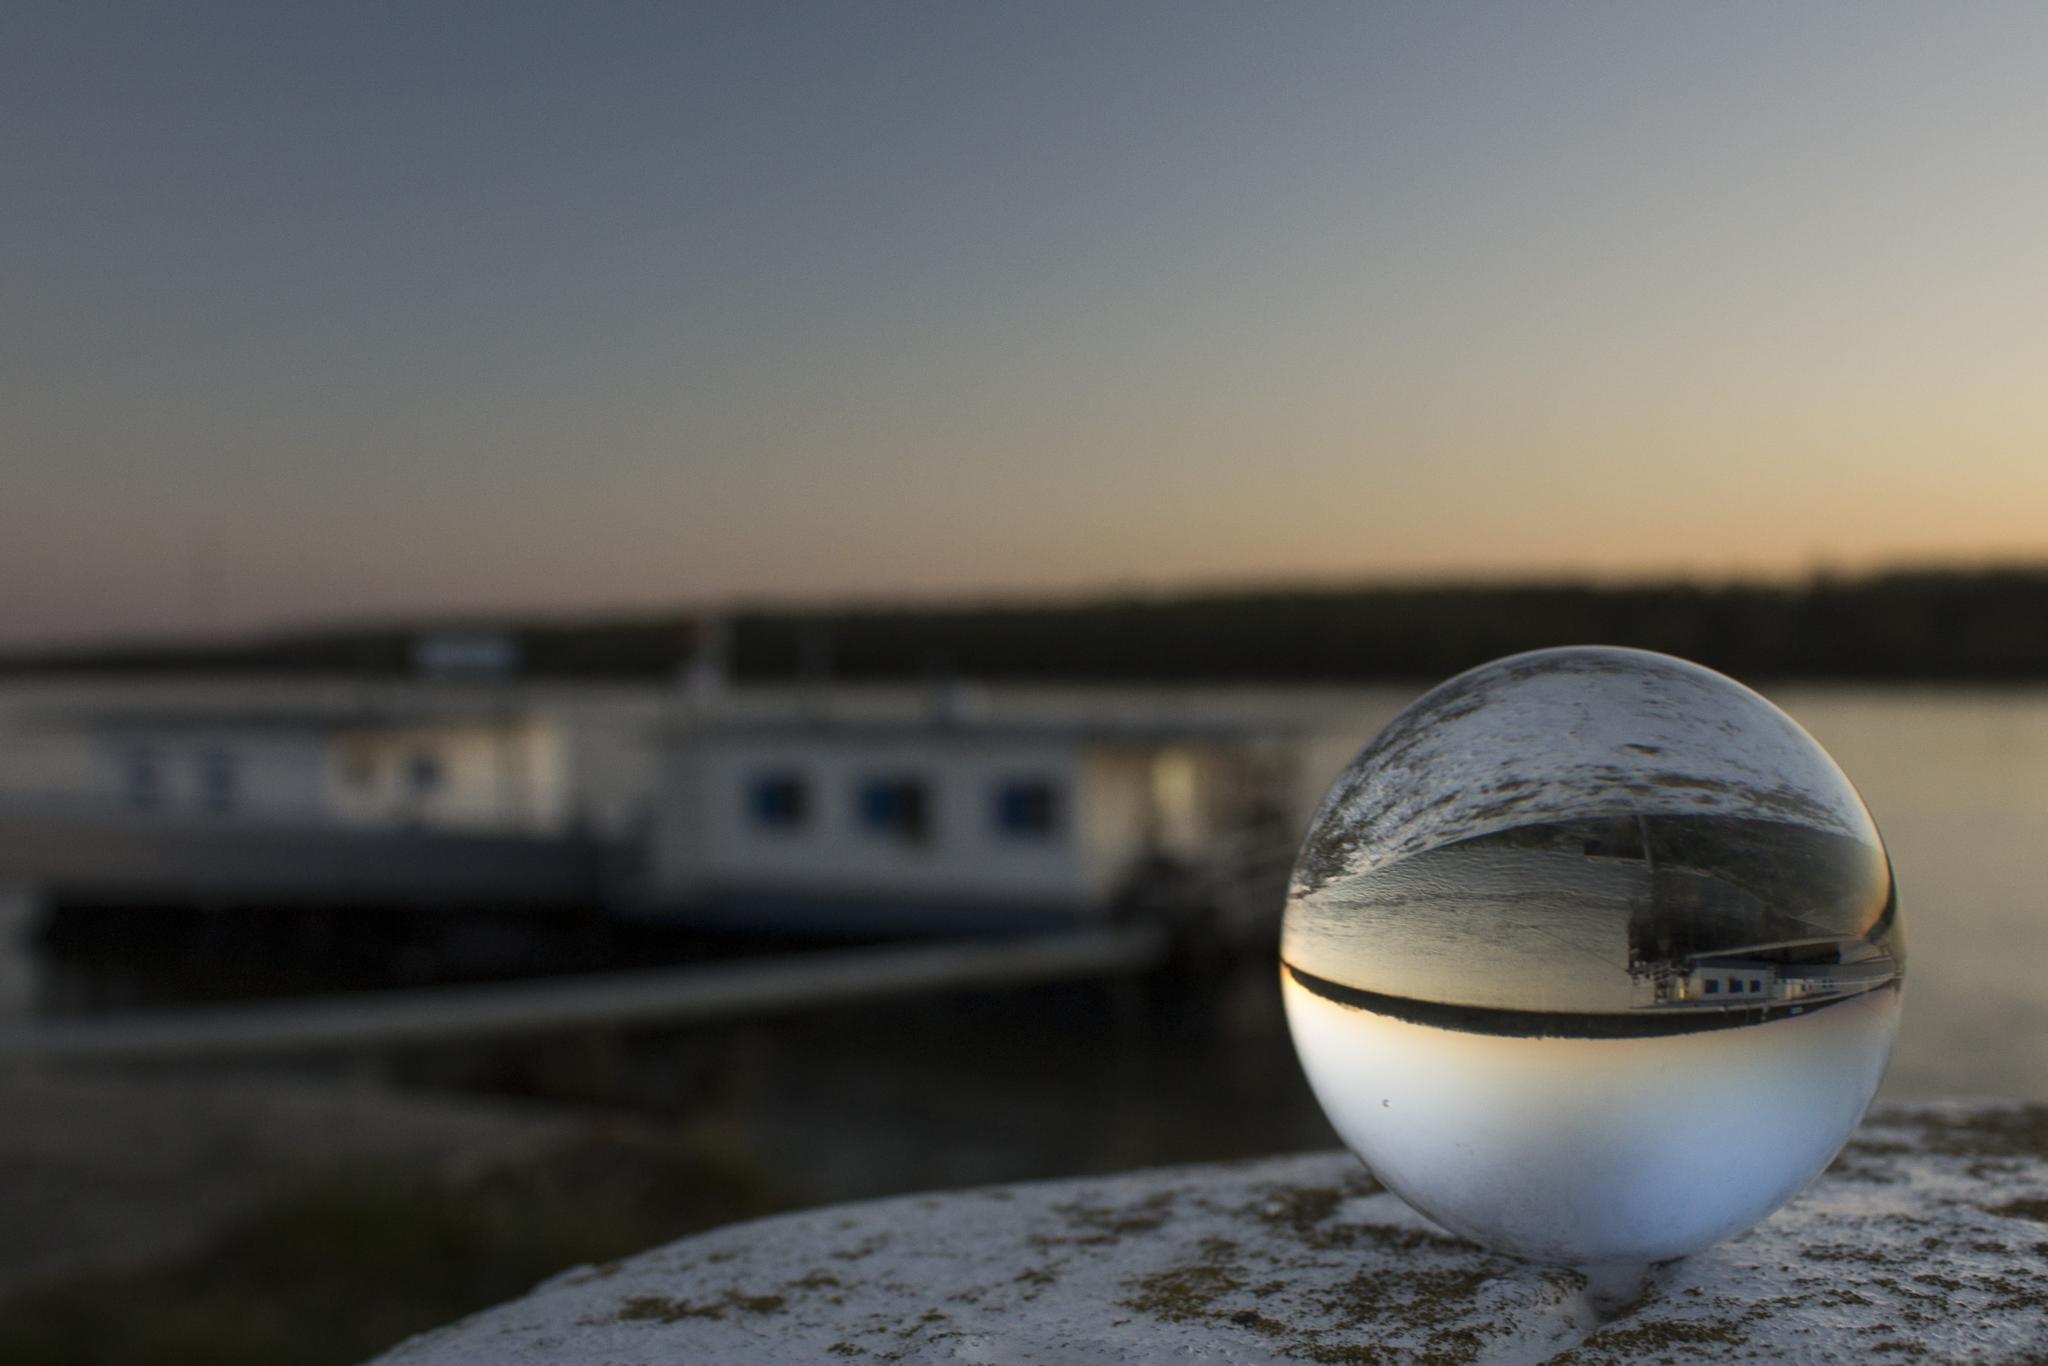 glass sphere by Banhidai Beata